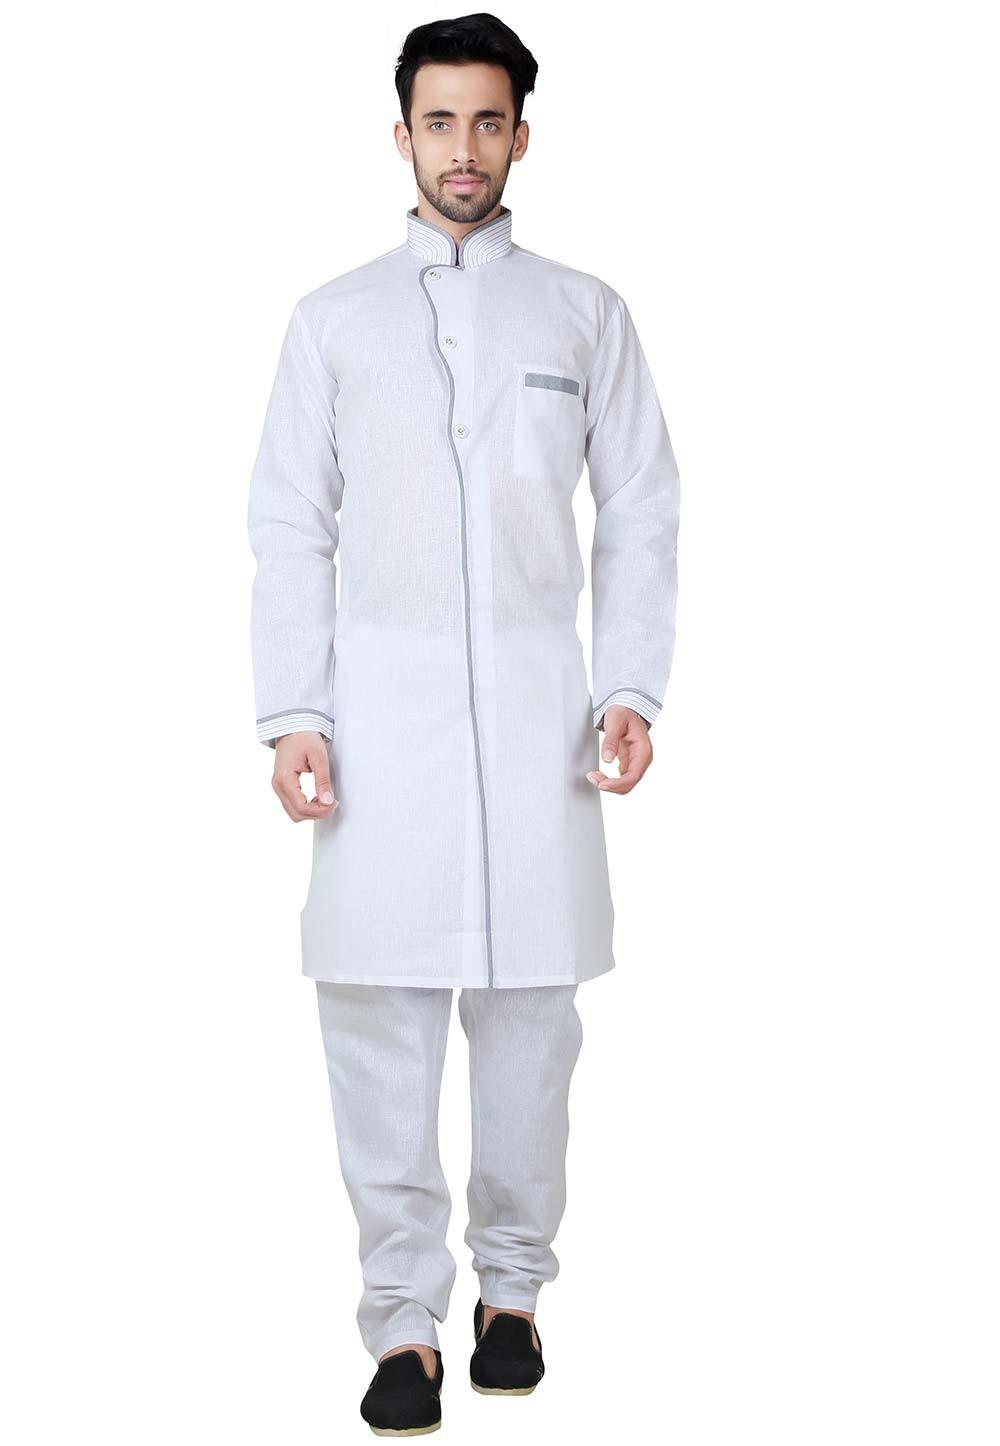 White Color Cotton, Linen Fabric Plain Pathani Kurta Pajama Online